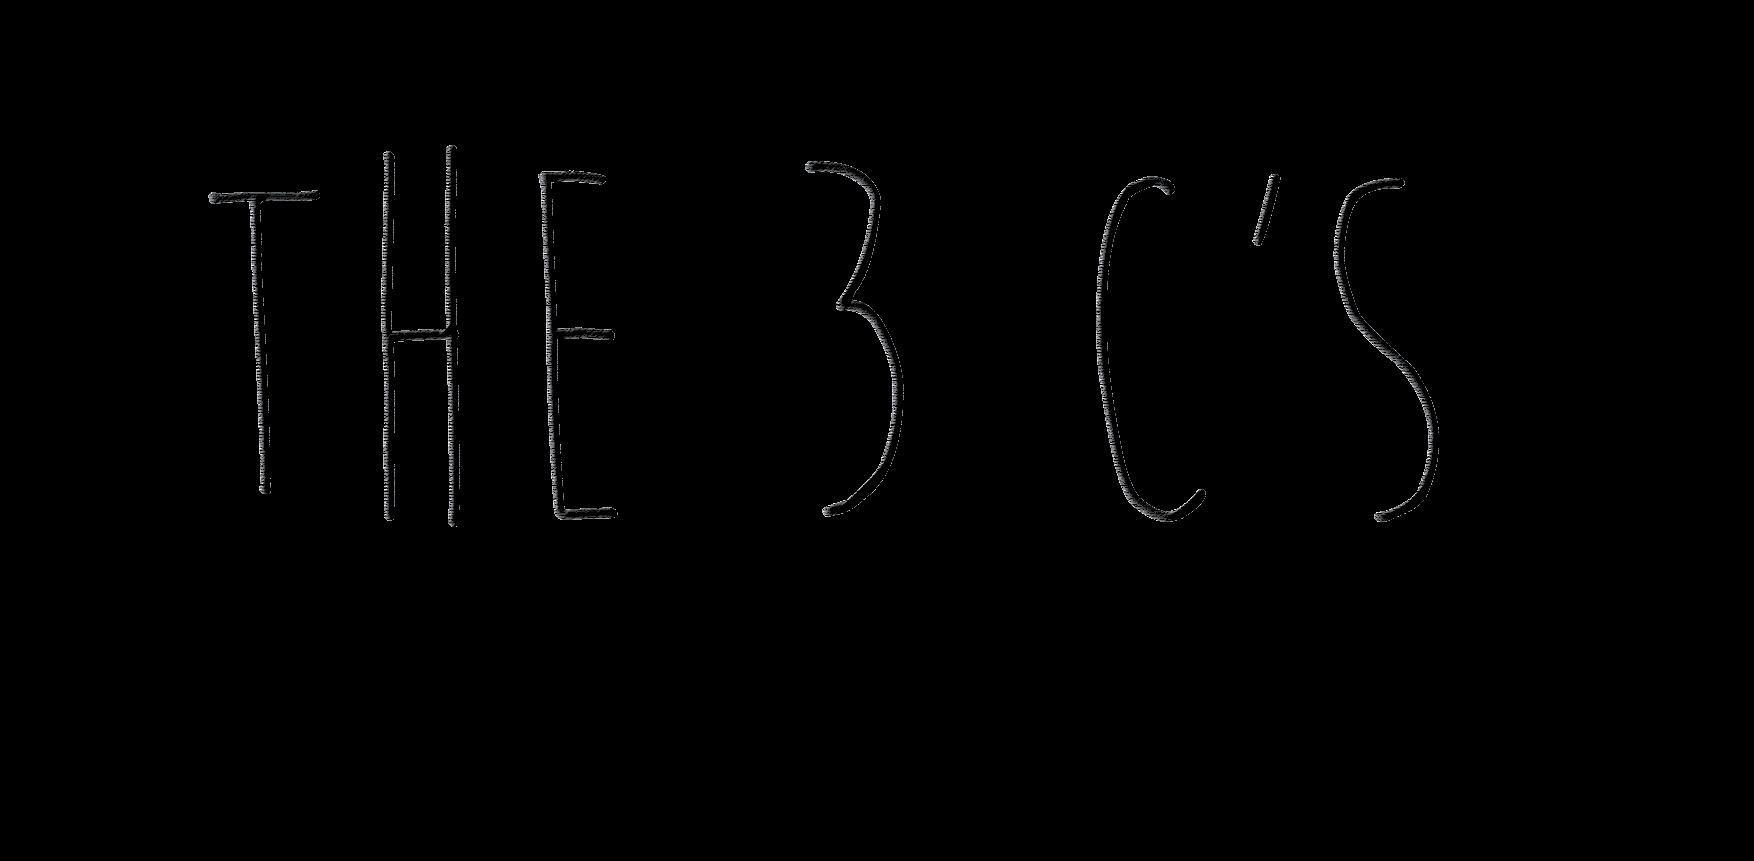 3 cs-01